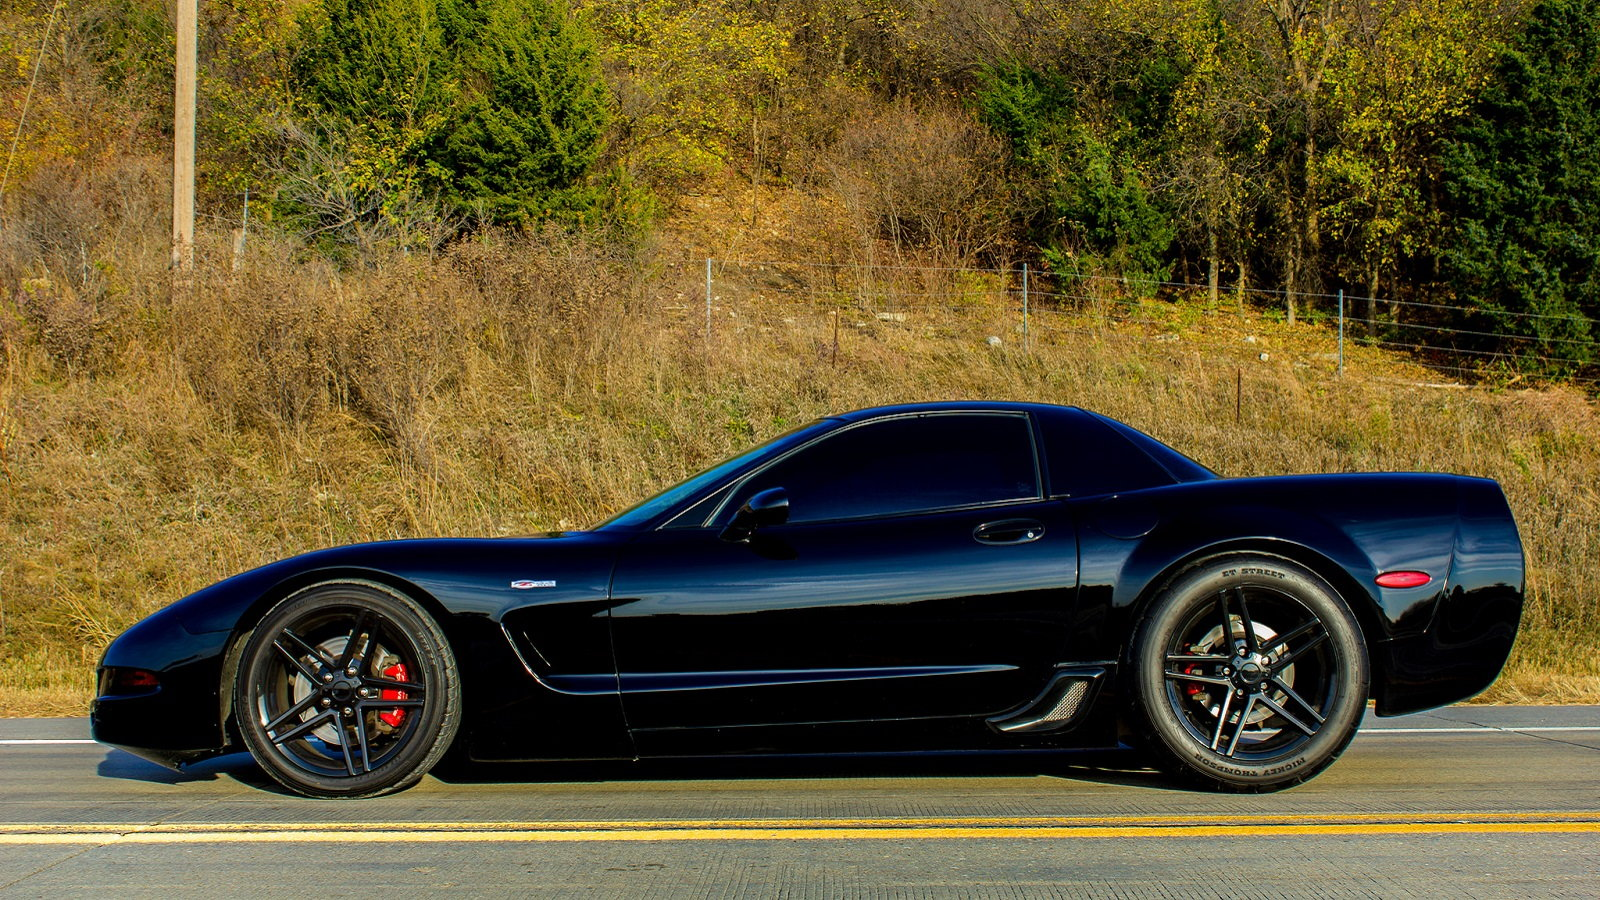 C5 Corvette Z06 Buyer's Guide to Bargain Performance